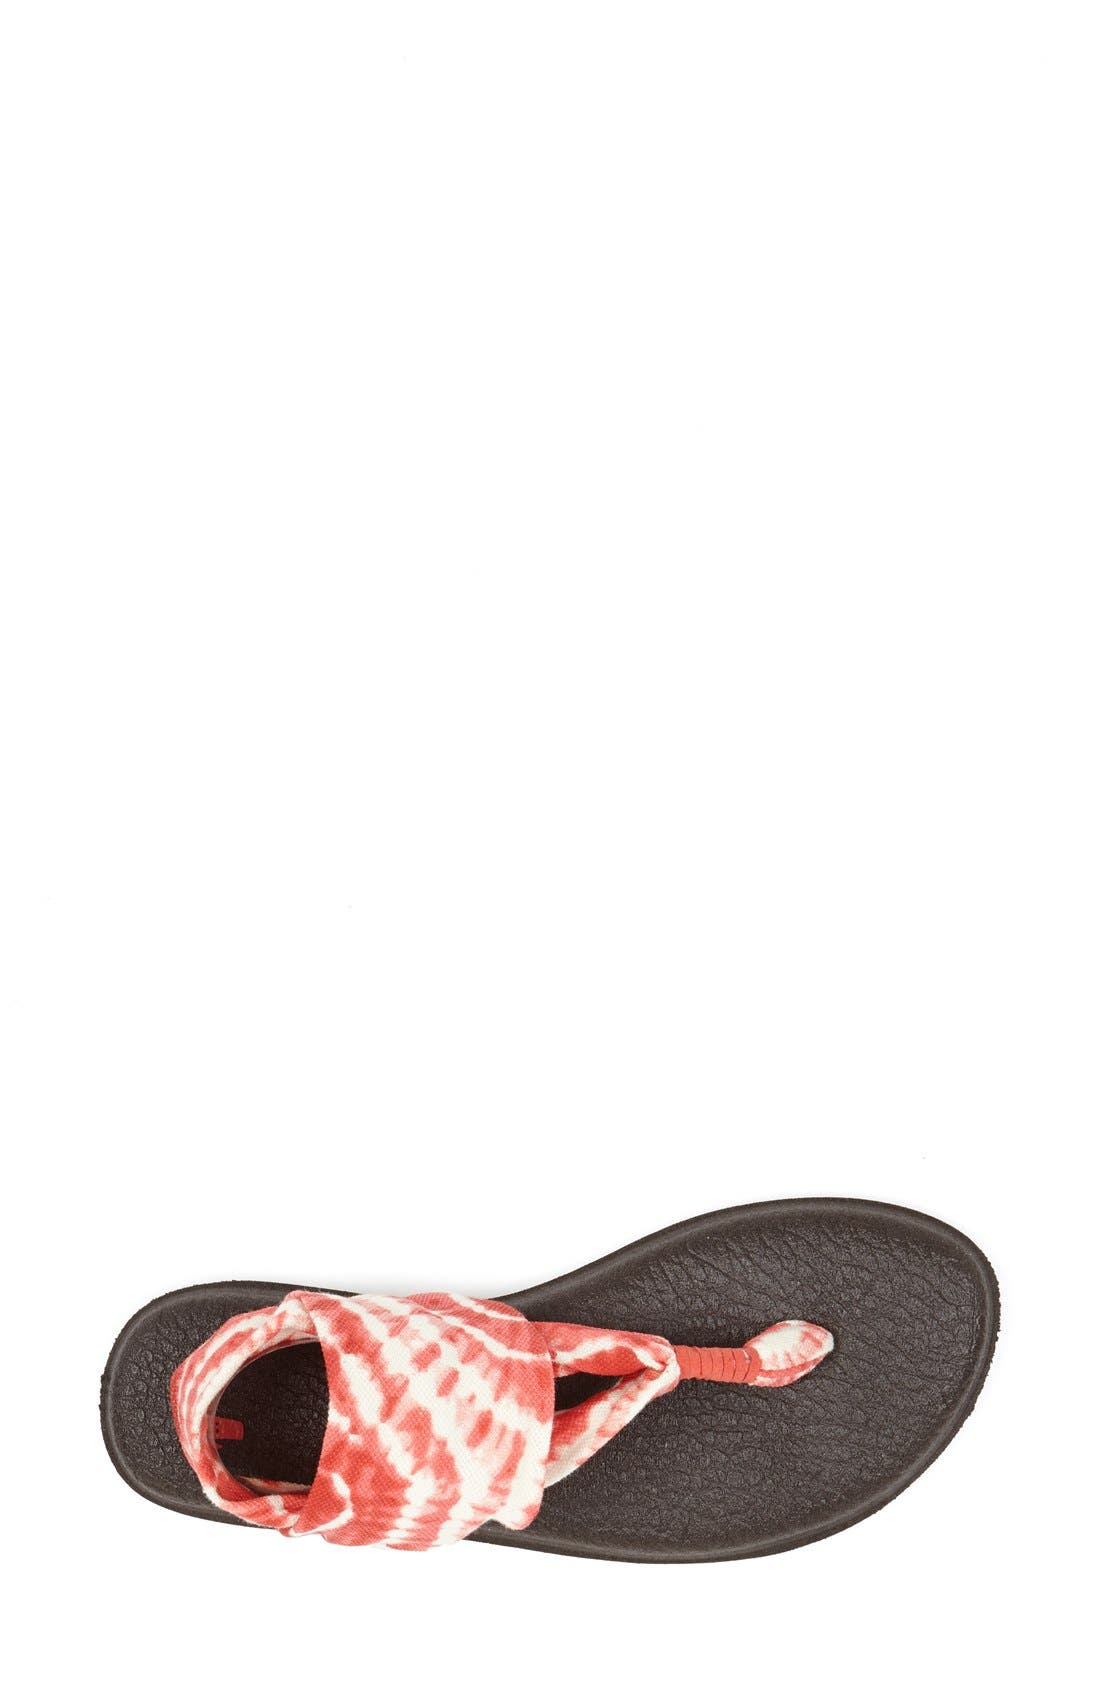 'Yoga Sling 2' Sandal,                             Alternate thumbnail 75, color,